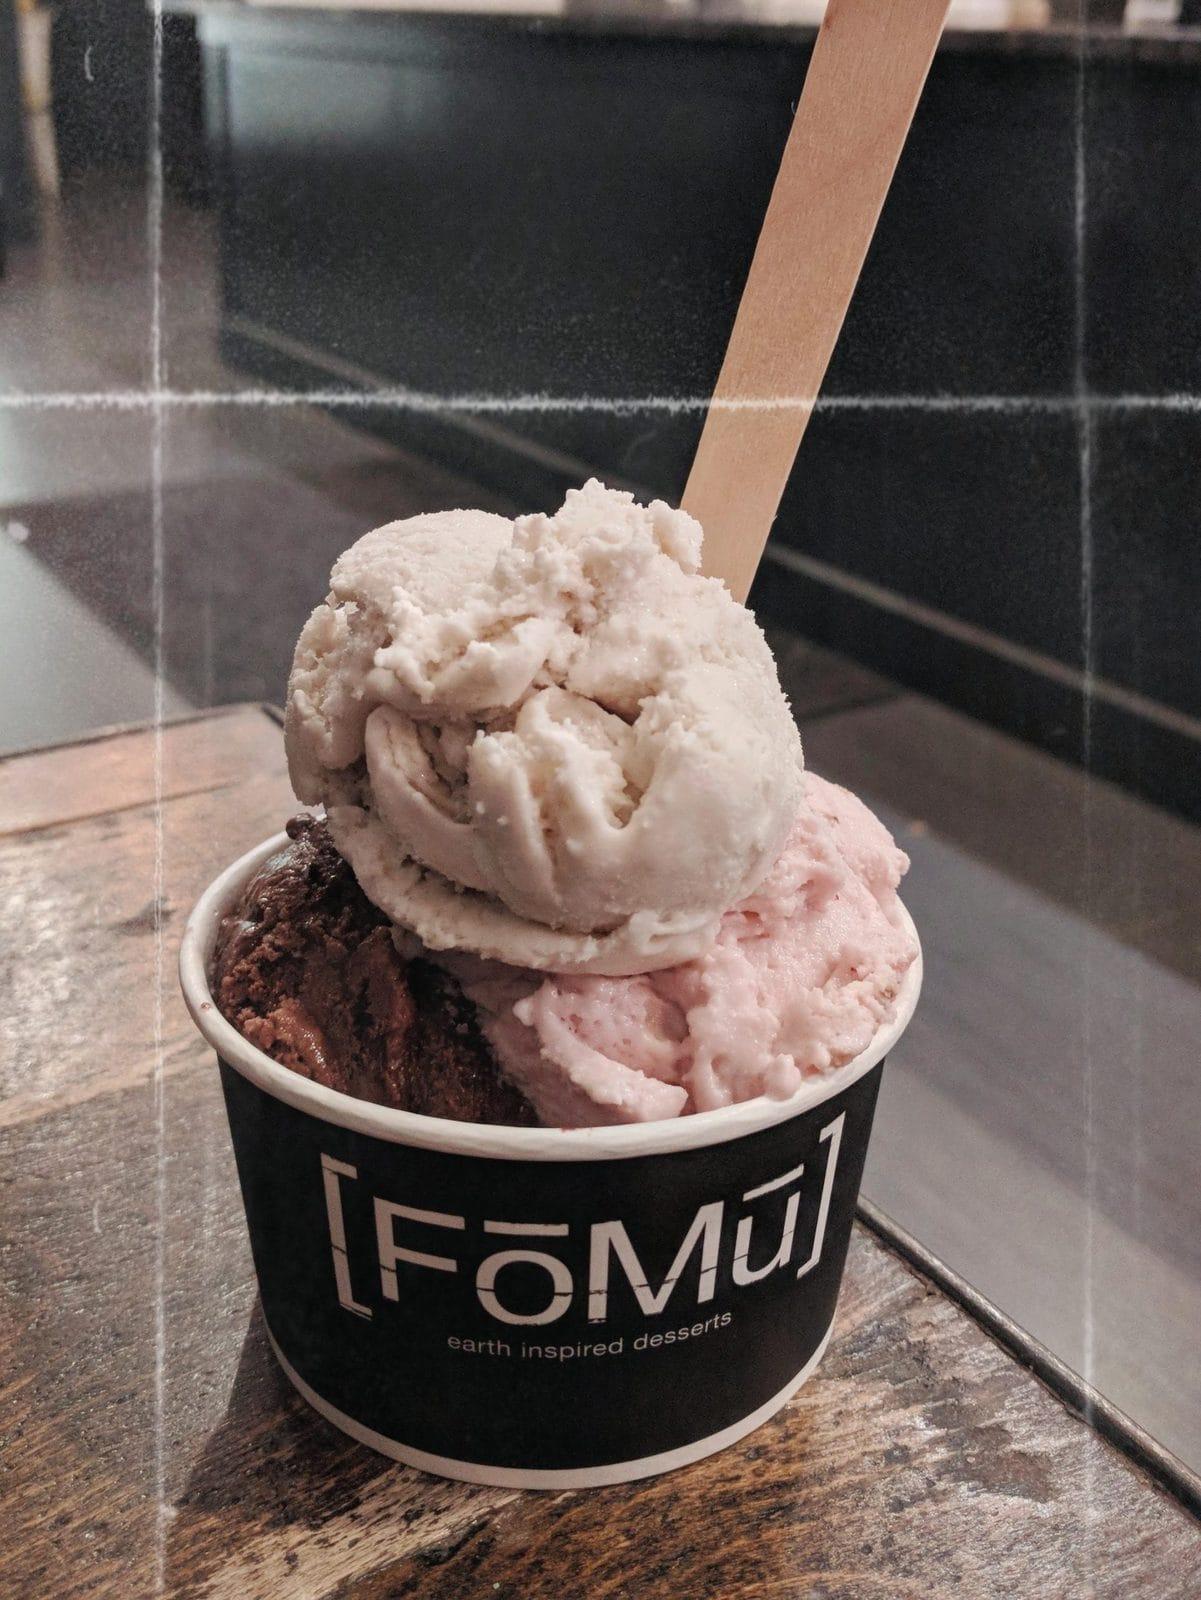 vanilla and strawberry ice cream in a cup